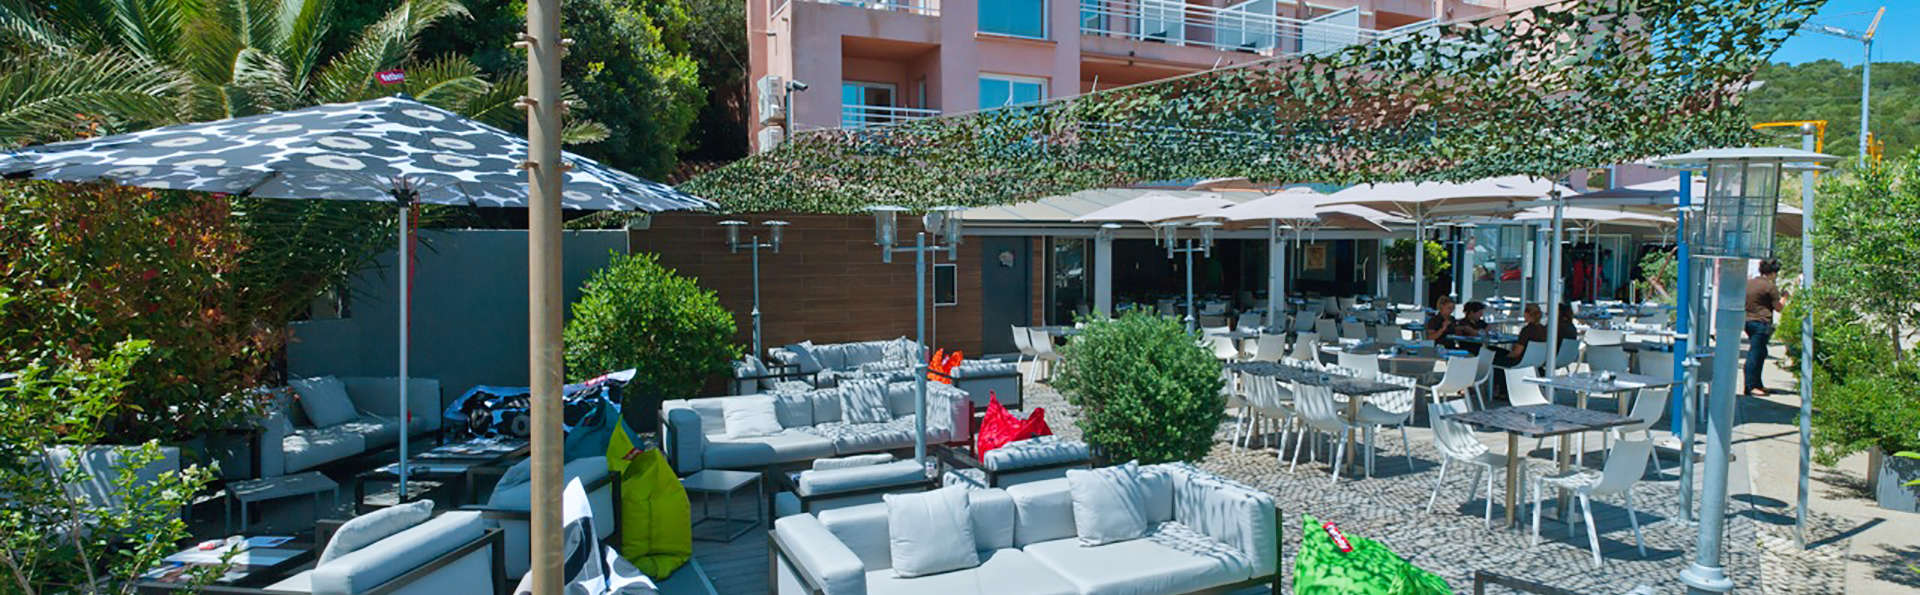 Hôtel Le Golfe - EDIT_Fachada_1.jpg